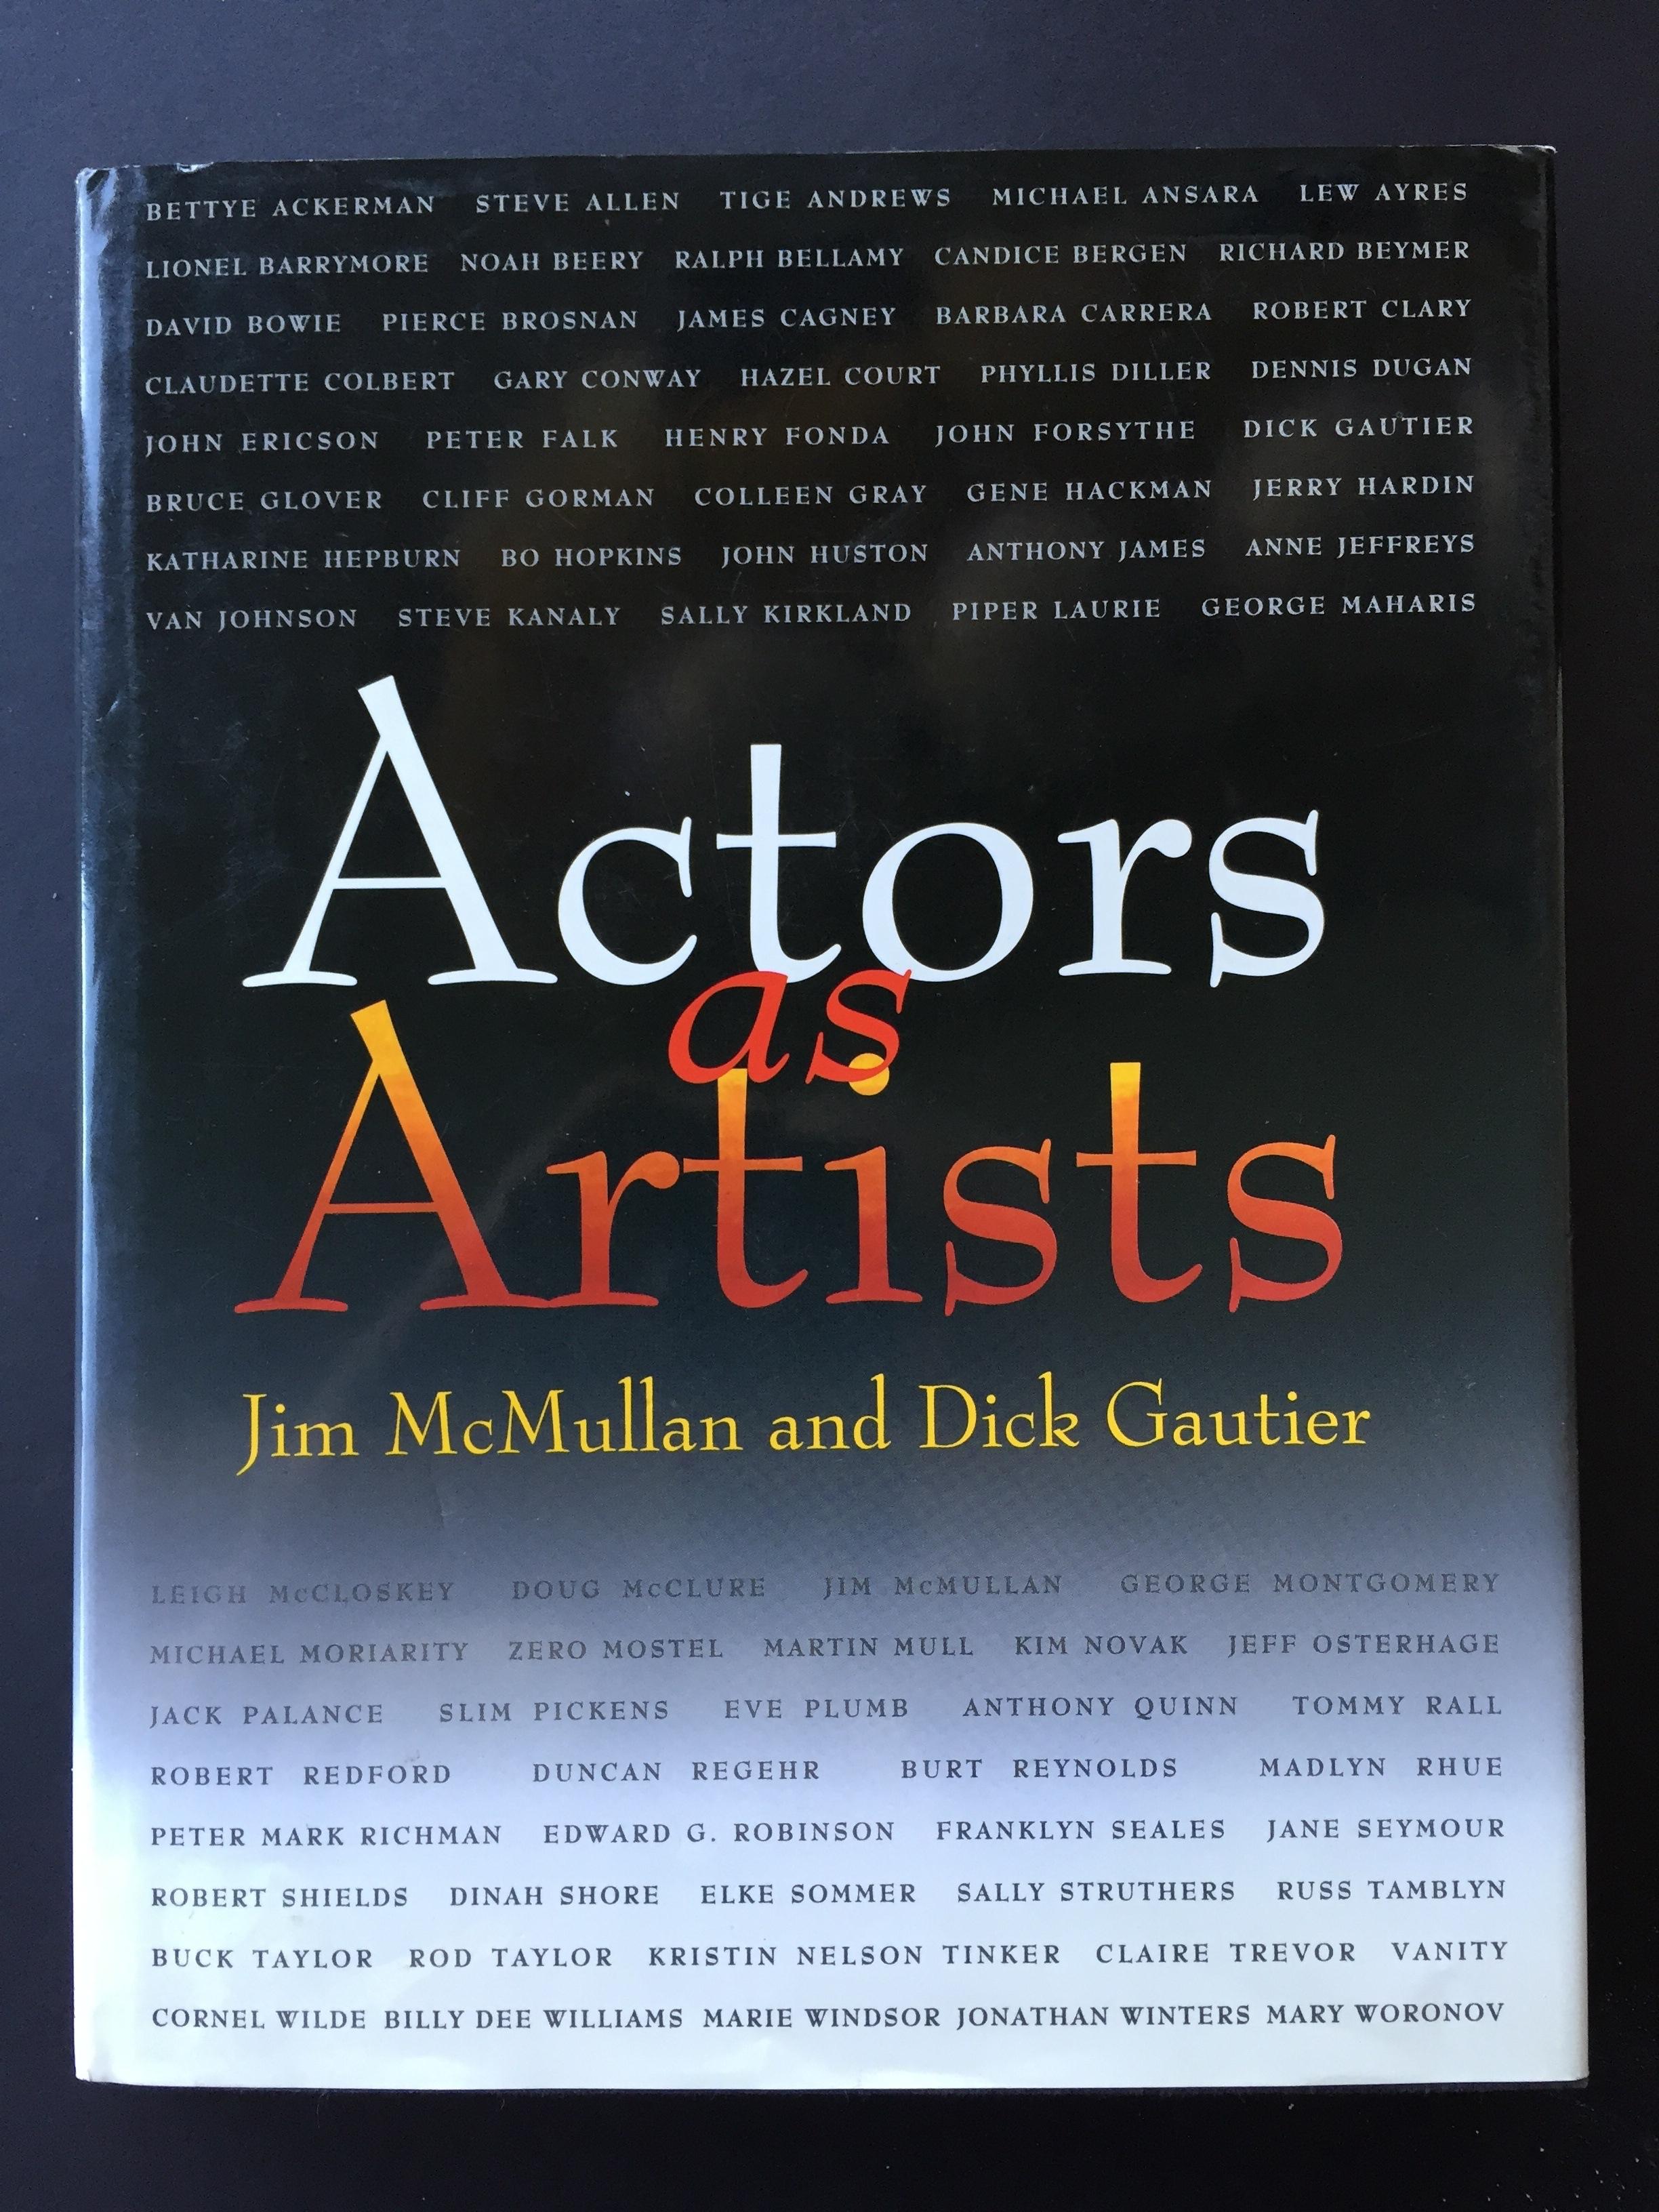 Actors as Artists